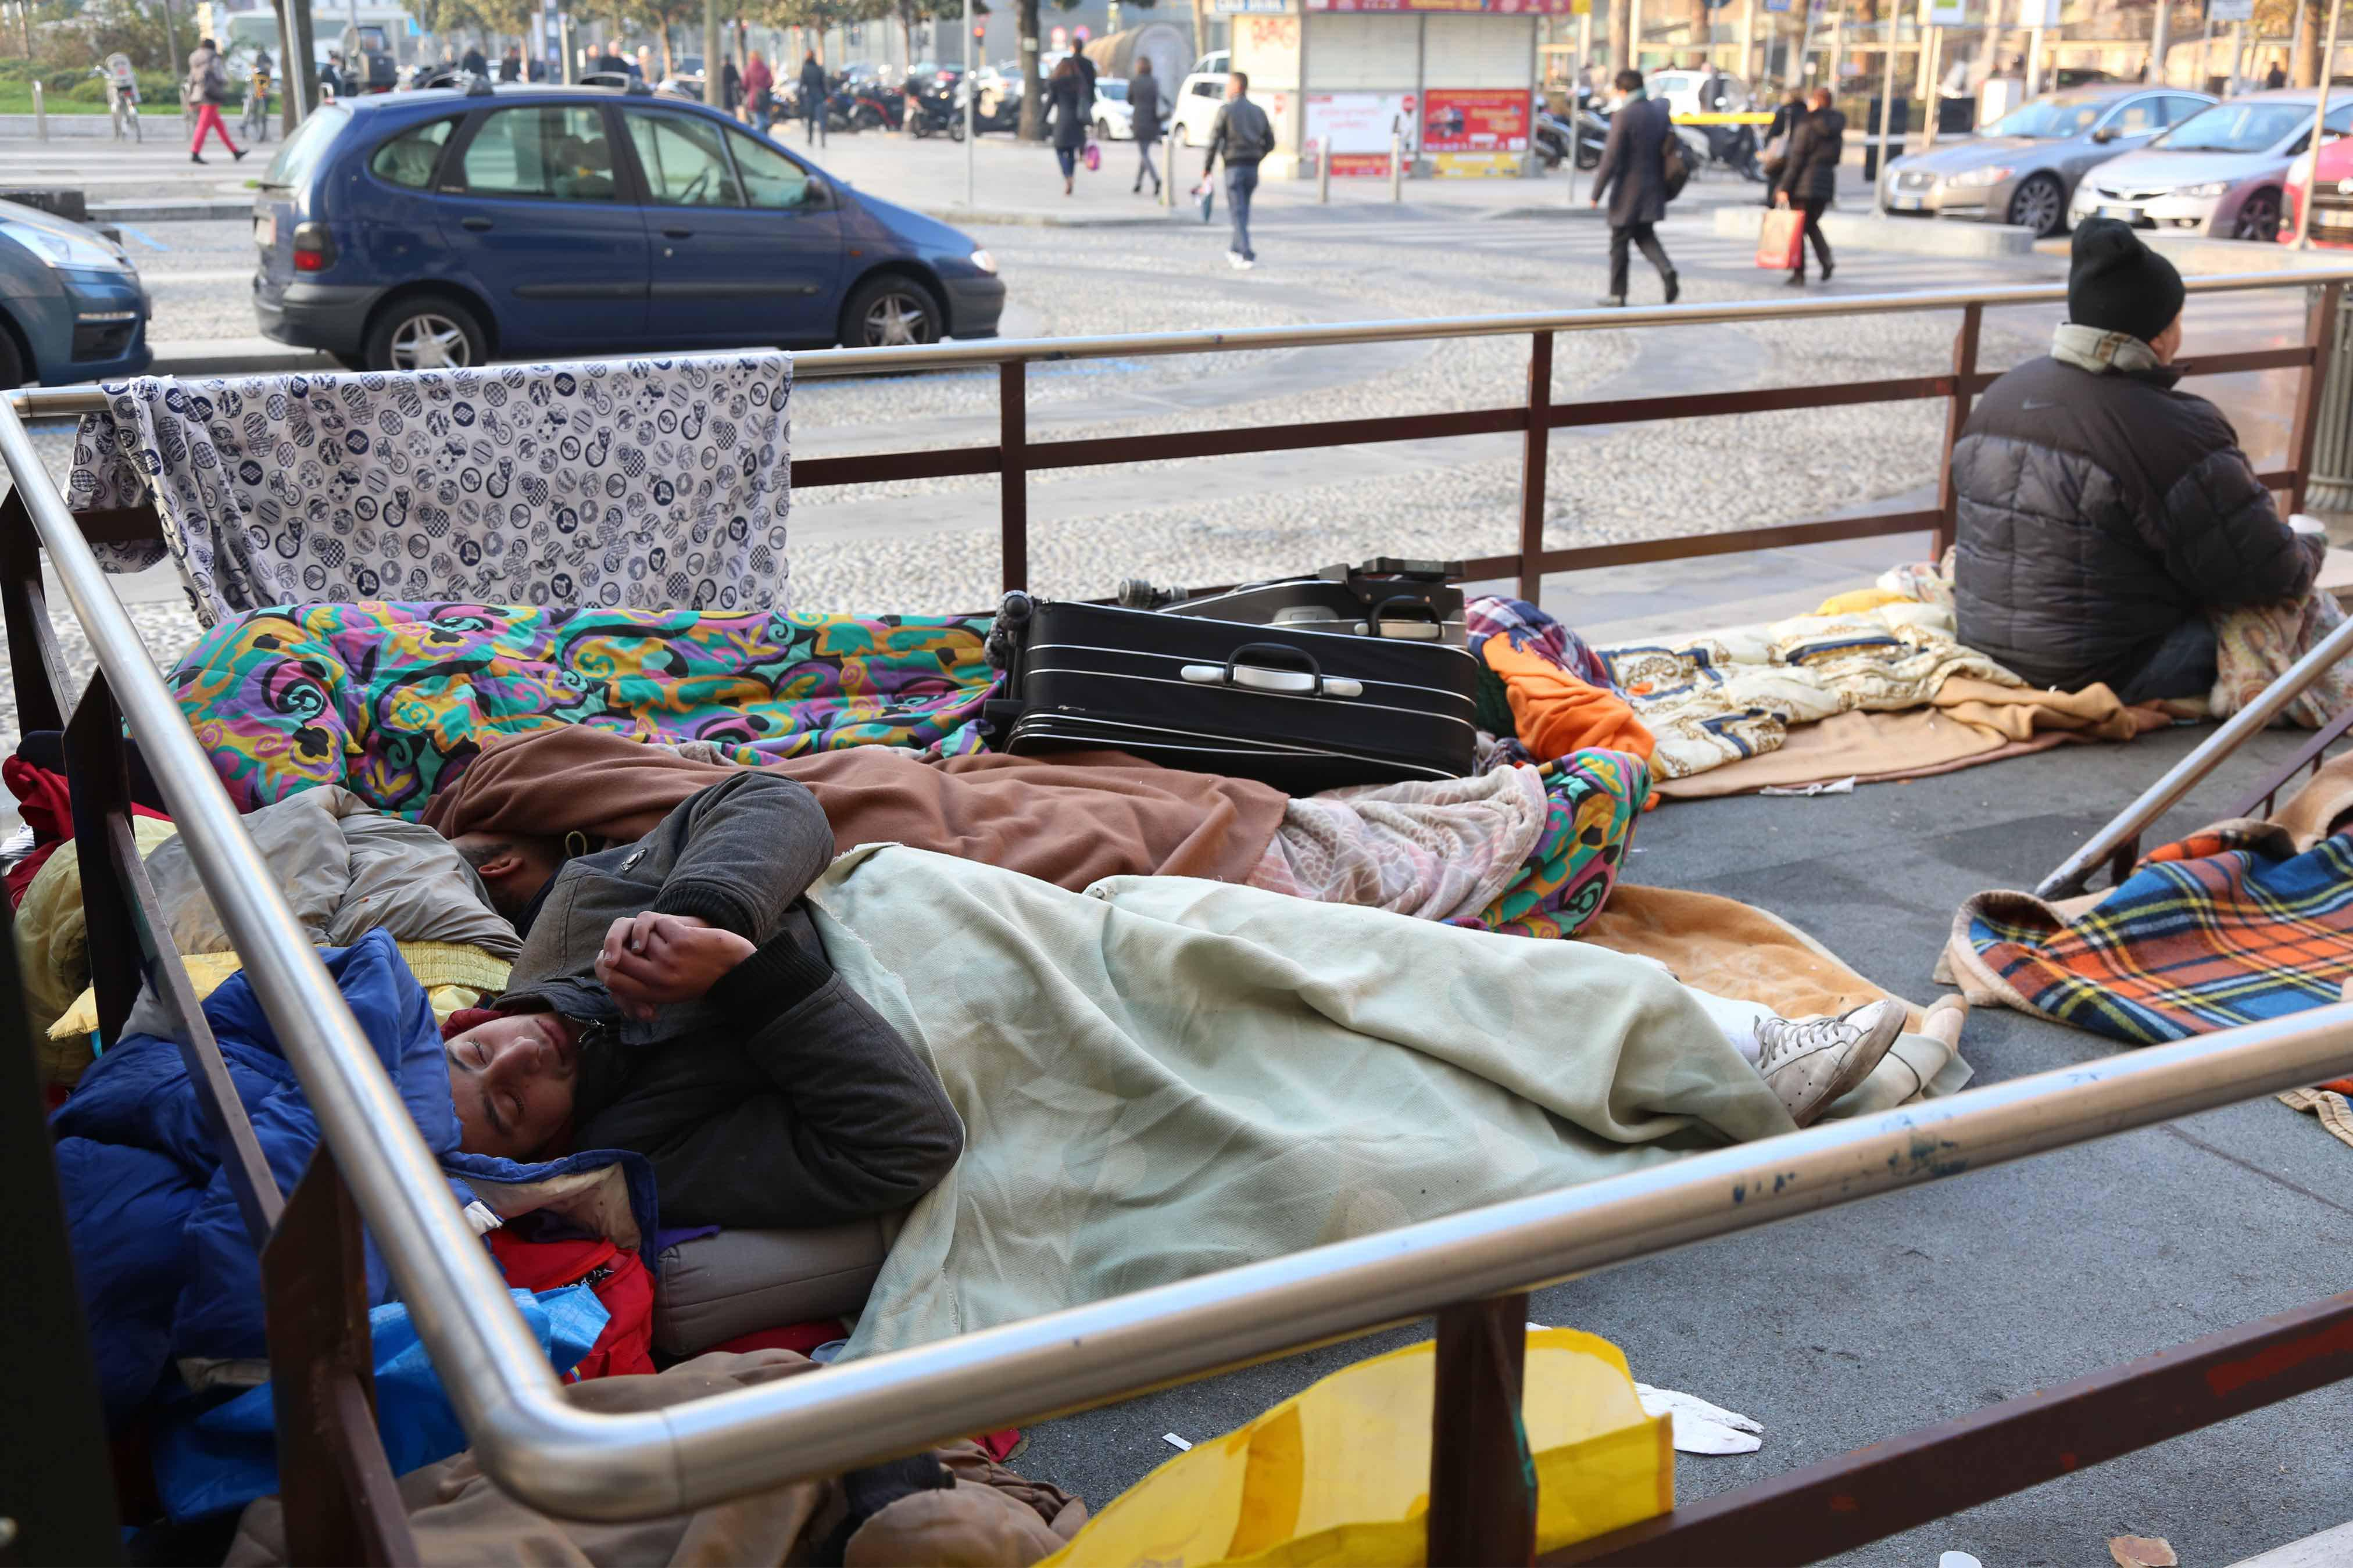 Povertà, in 10 anni raddoppiate le famiglie indigenti